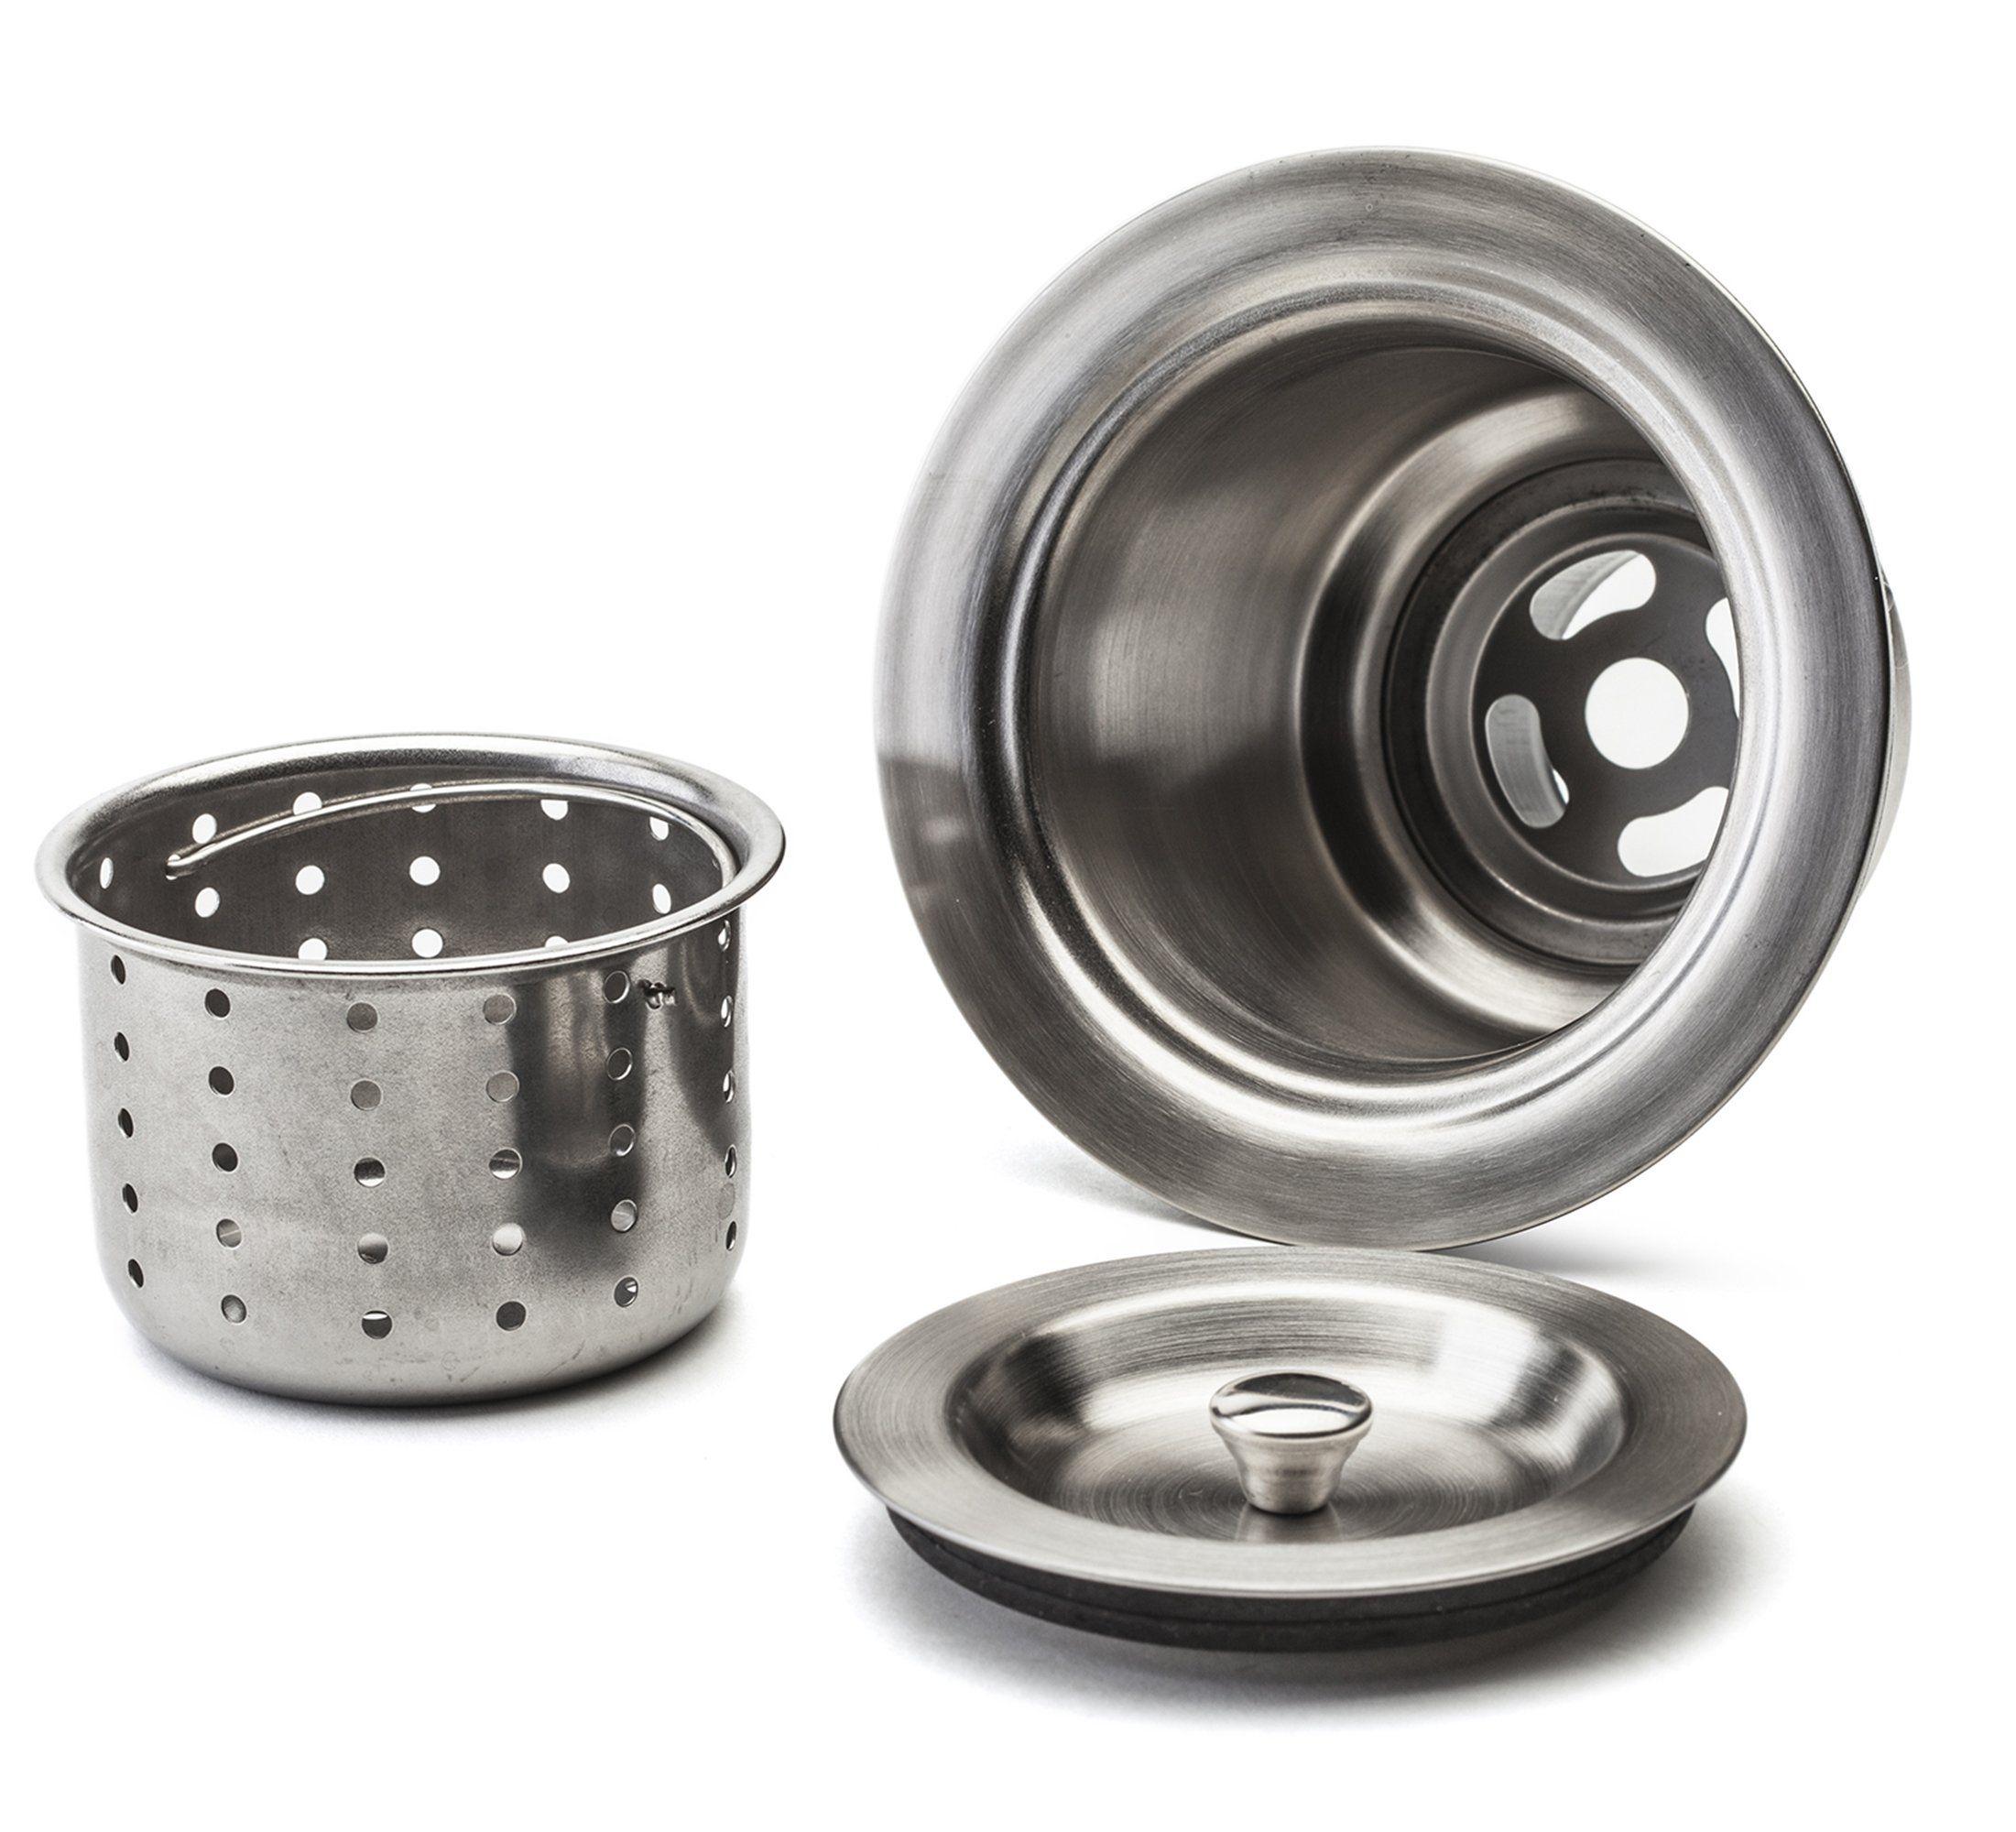 Kitchen Sink Drain Assembly Liquidation Cabinets Fluxe 3 5 Inch Stainless Steel Deep Waste Basket